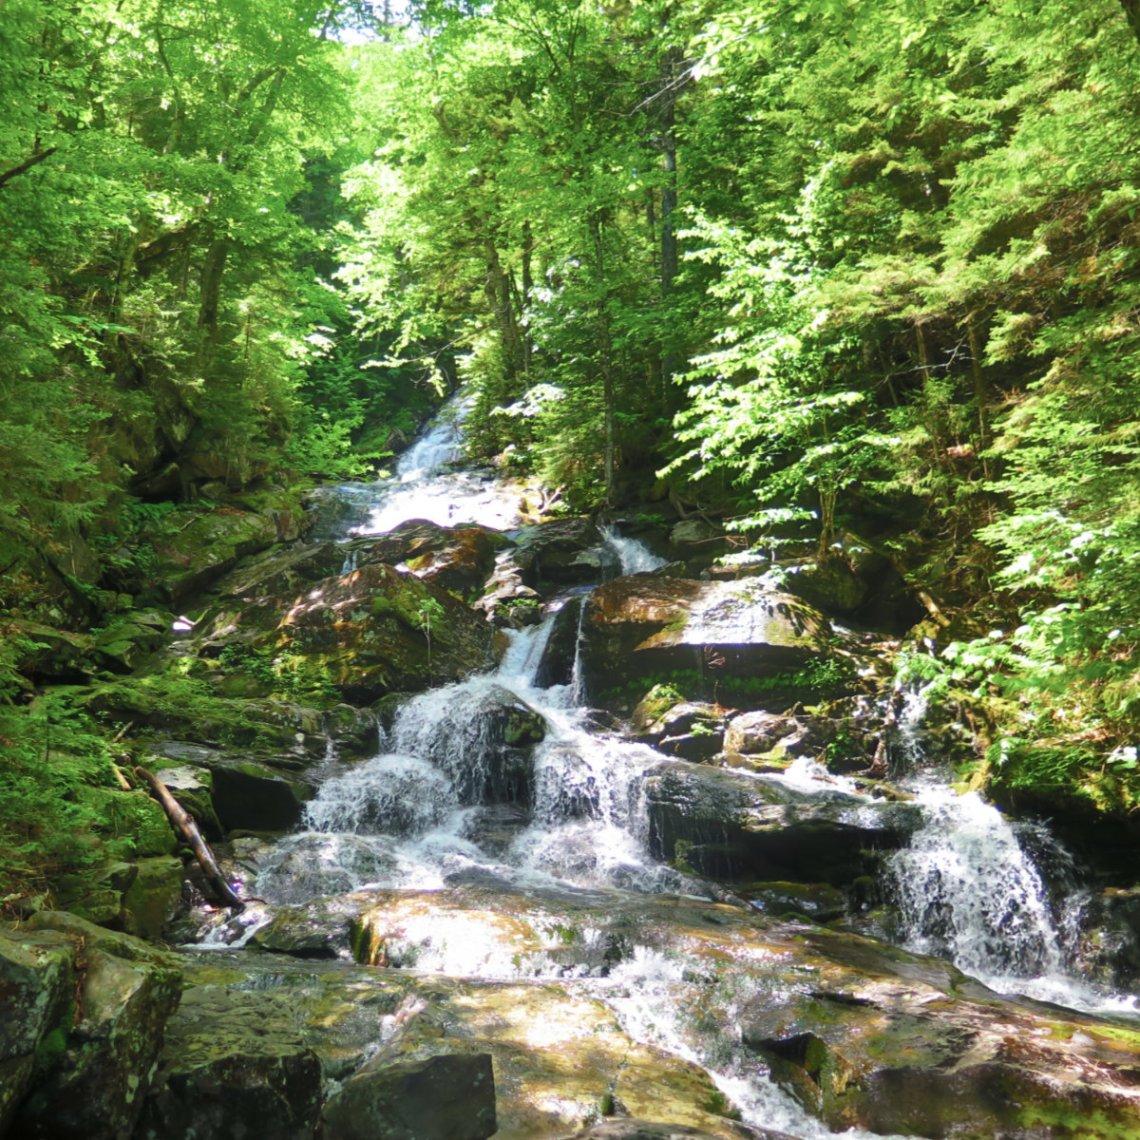 Moosilauke-Beaver-Brook-Cascades-20190627